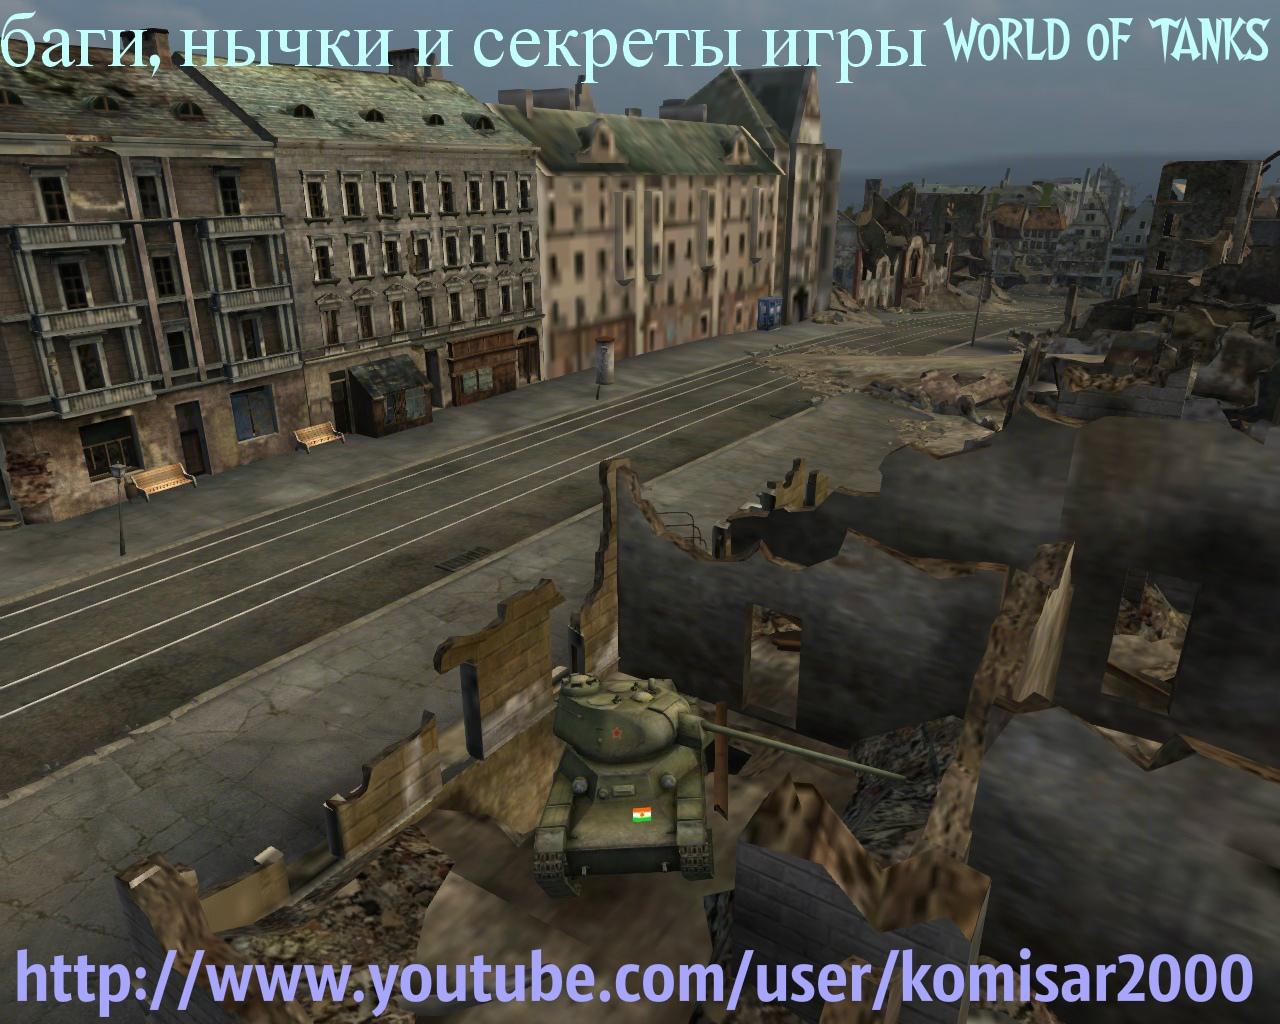 картинка ворд танк